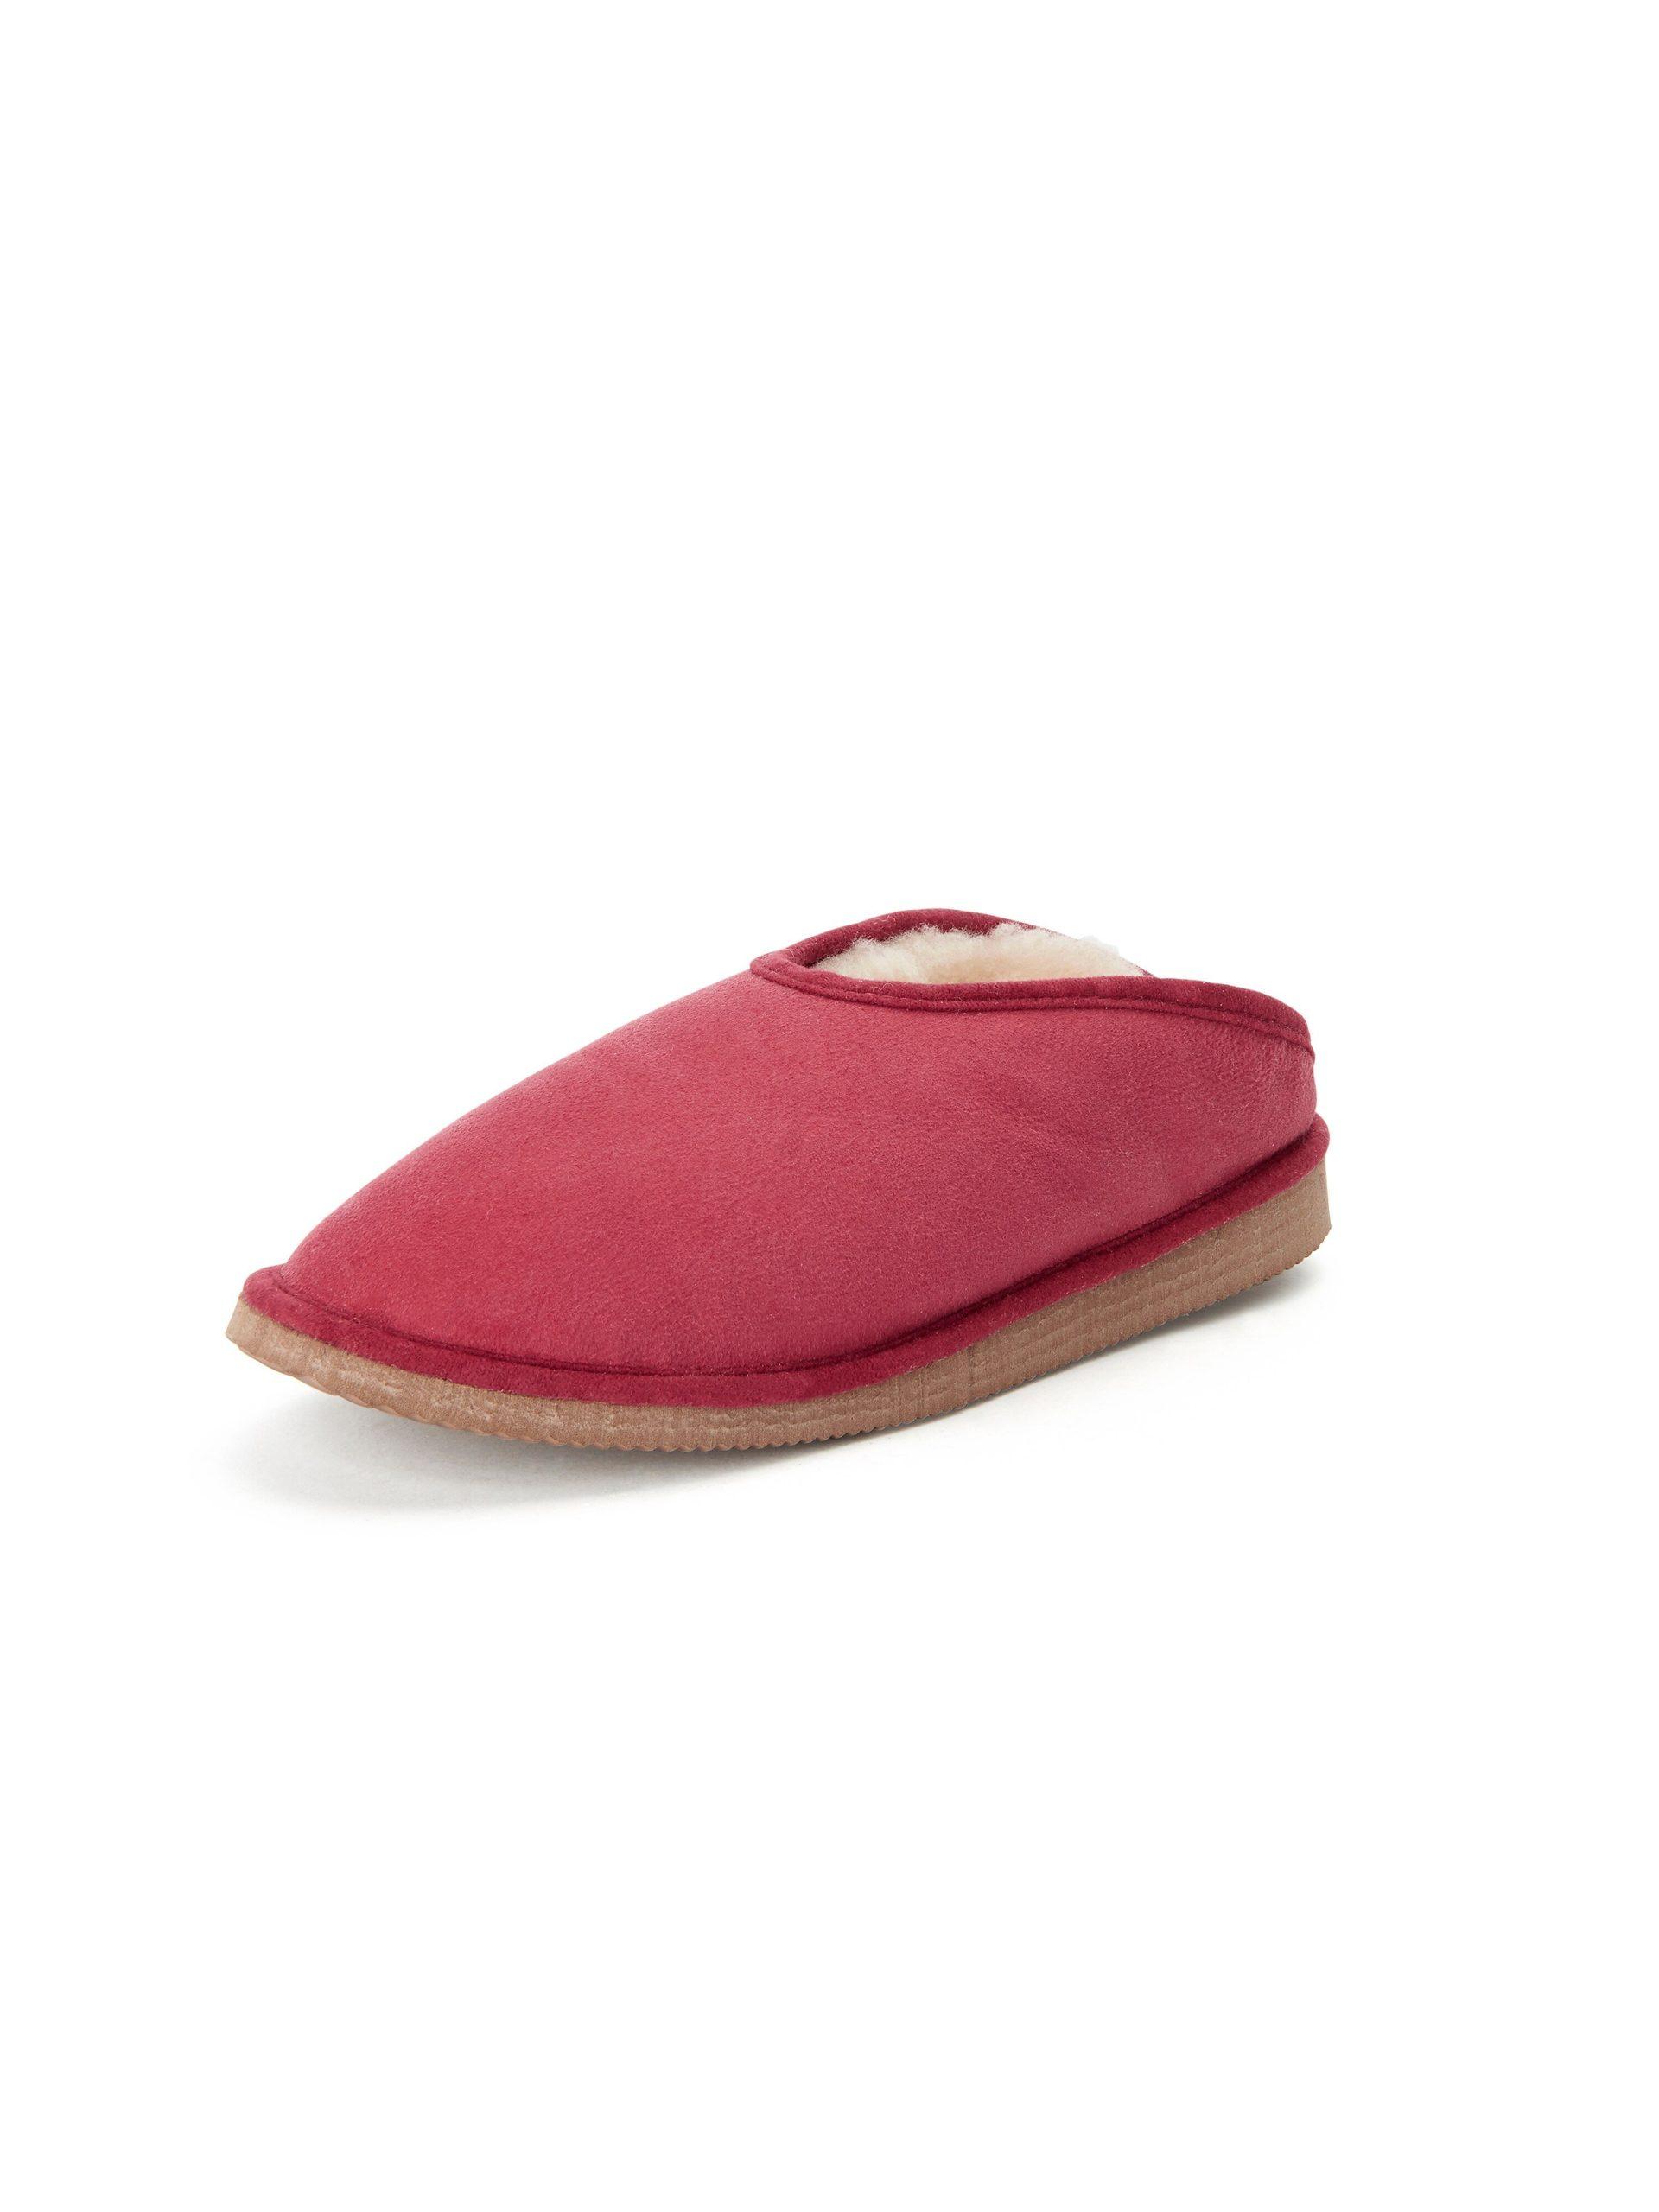 Lammy pantoffels, model Fatima Van Kitzpichler rood Kopen